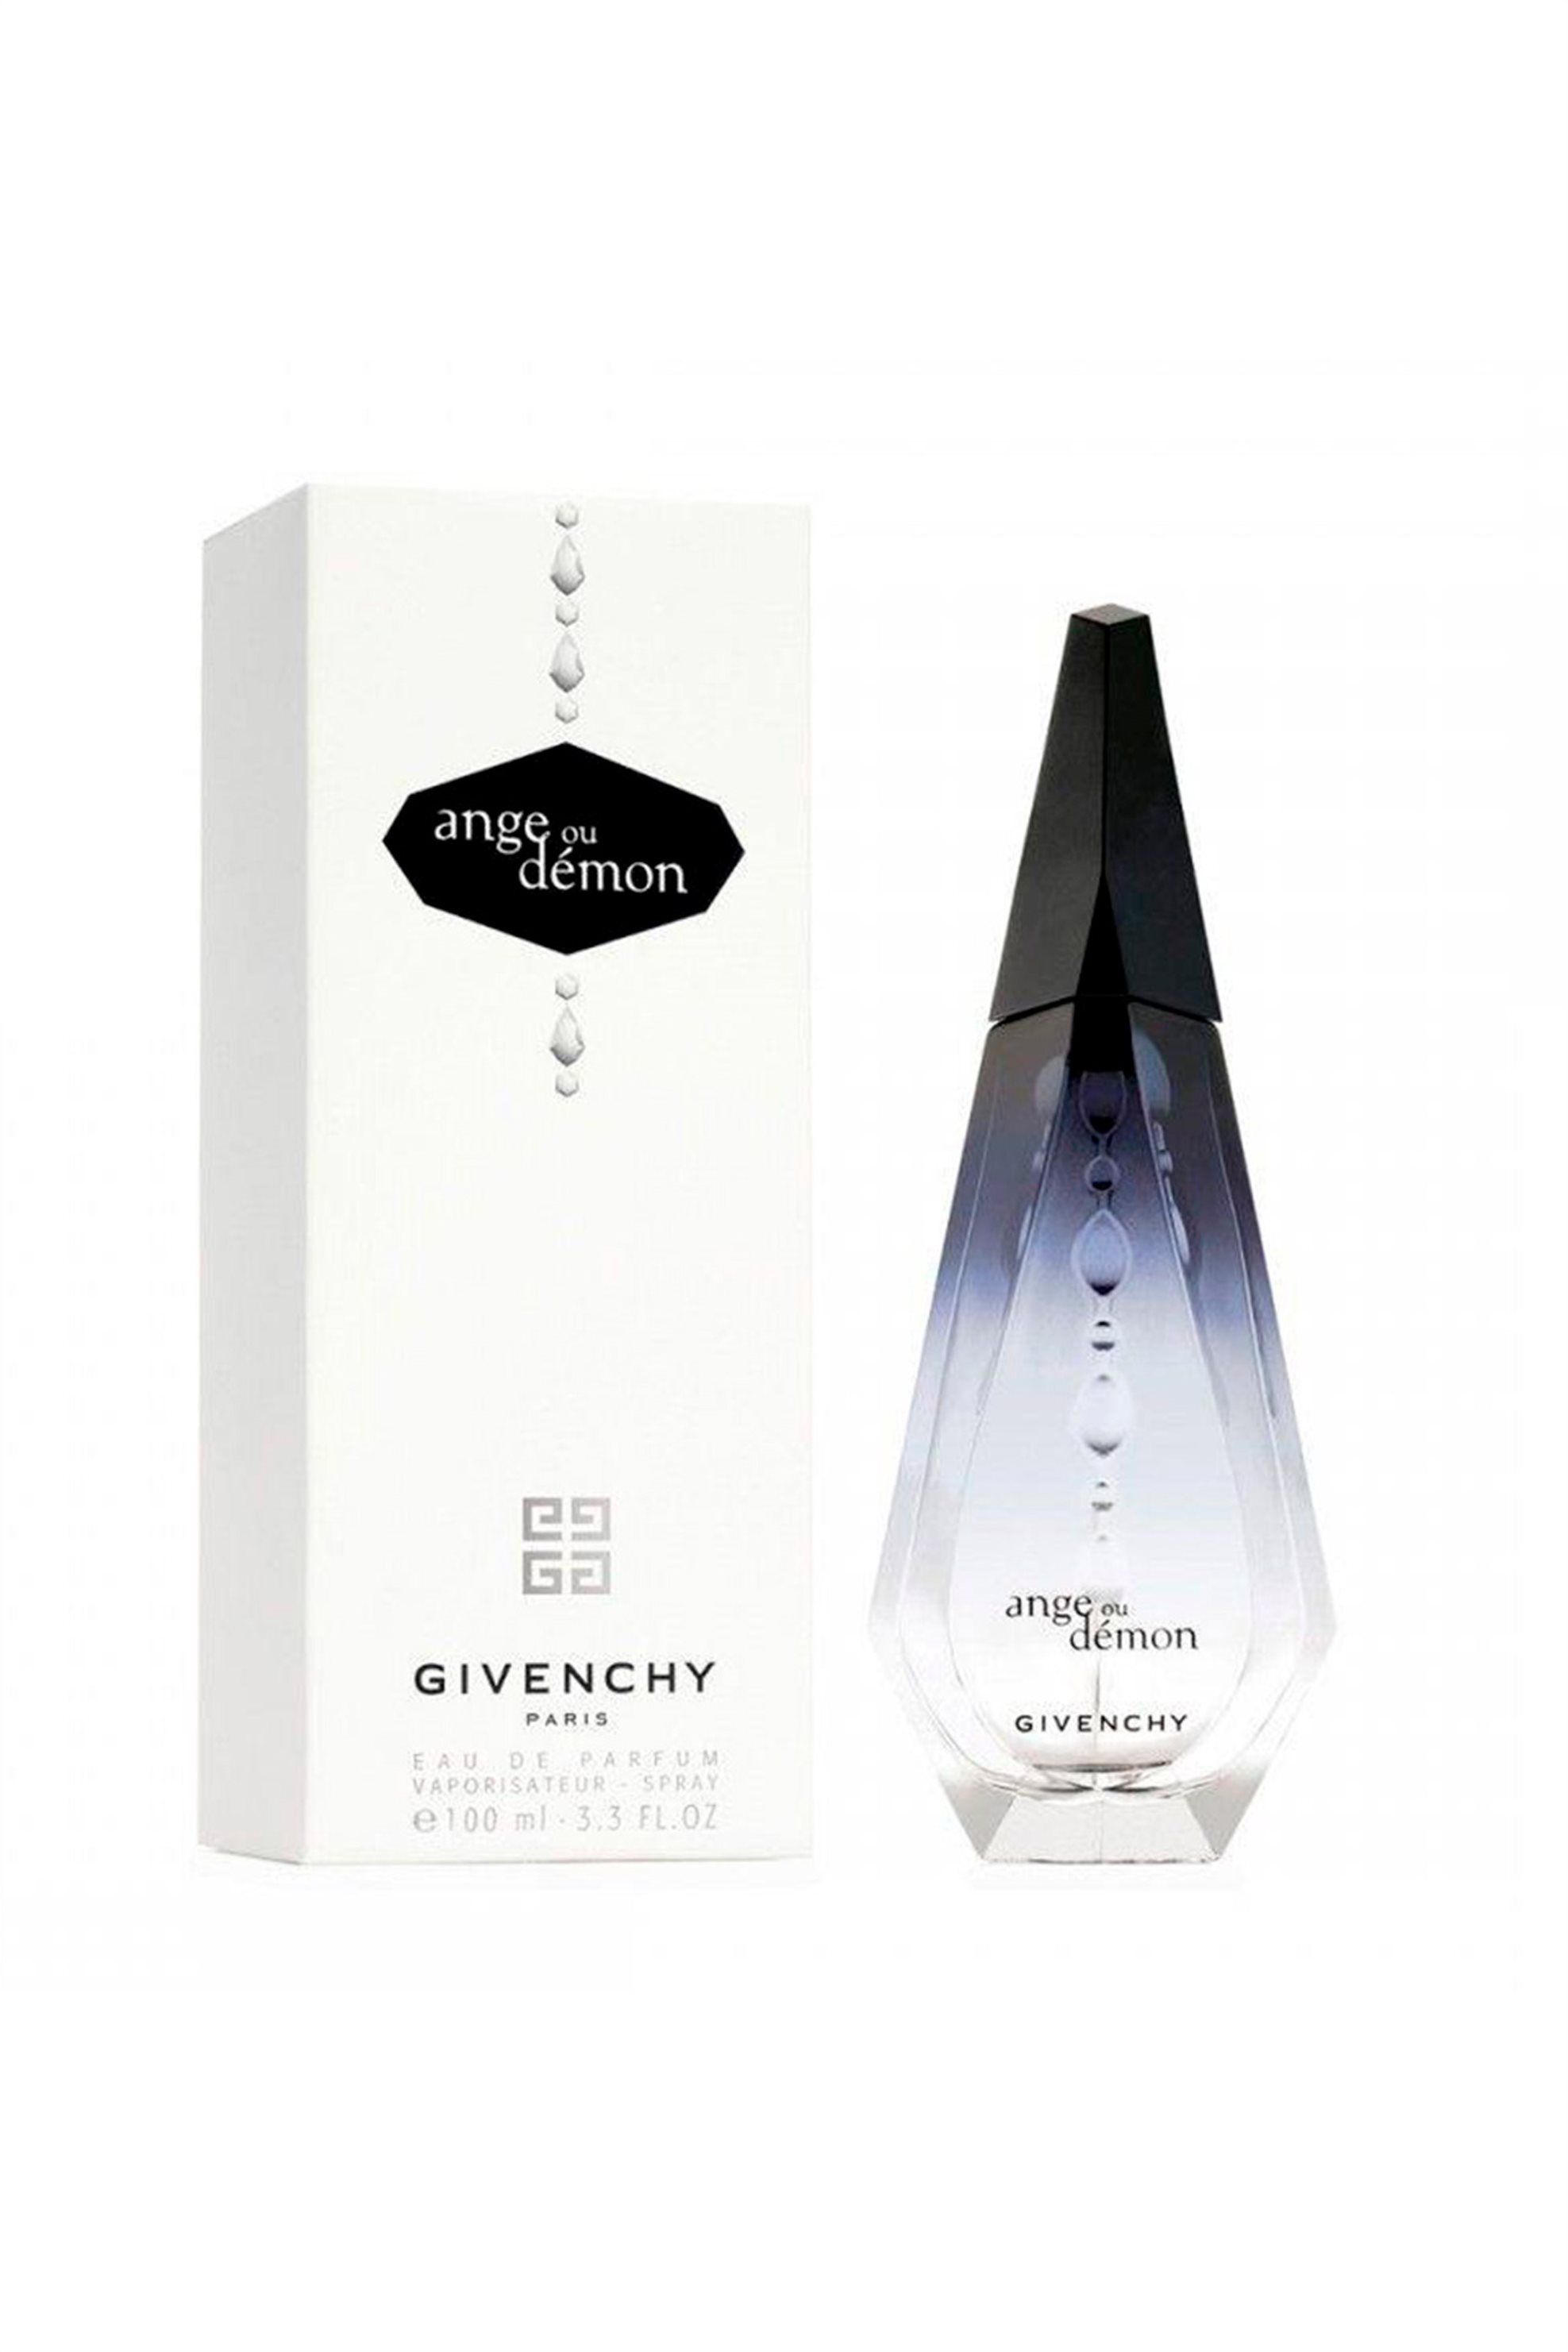 Givenchy Ange Ou Démon EdP 100 ml - P037326 ομορφια   καλλυντικα επιλεκτικησ   αρώματα   γυναικεία αρώματα   eau de parfum